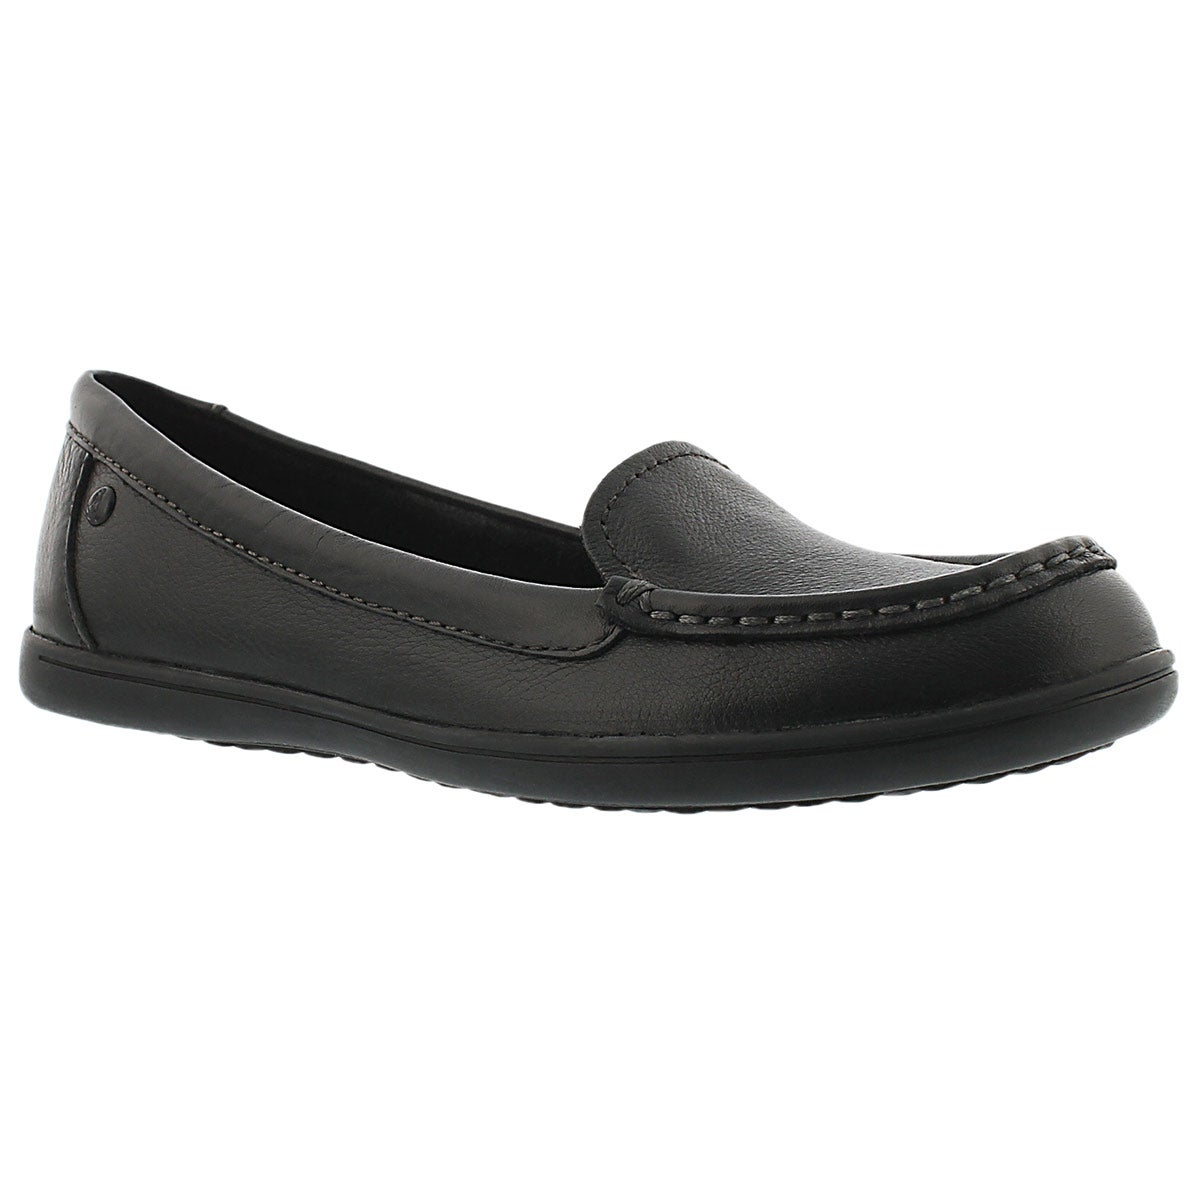 Women's RYANN CLAUDINE black casual loafers